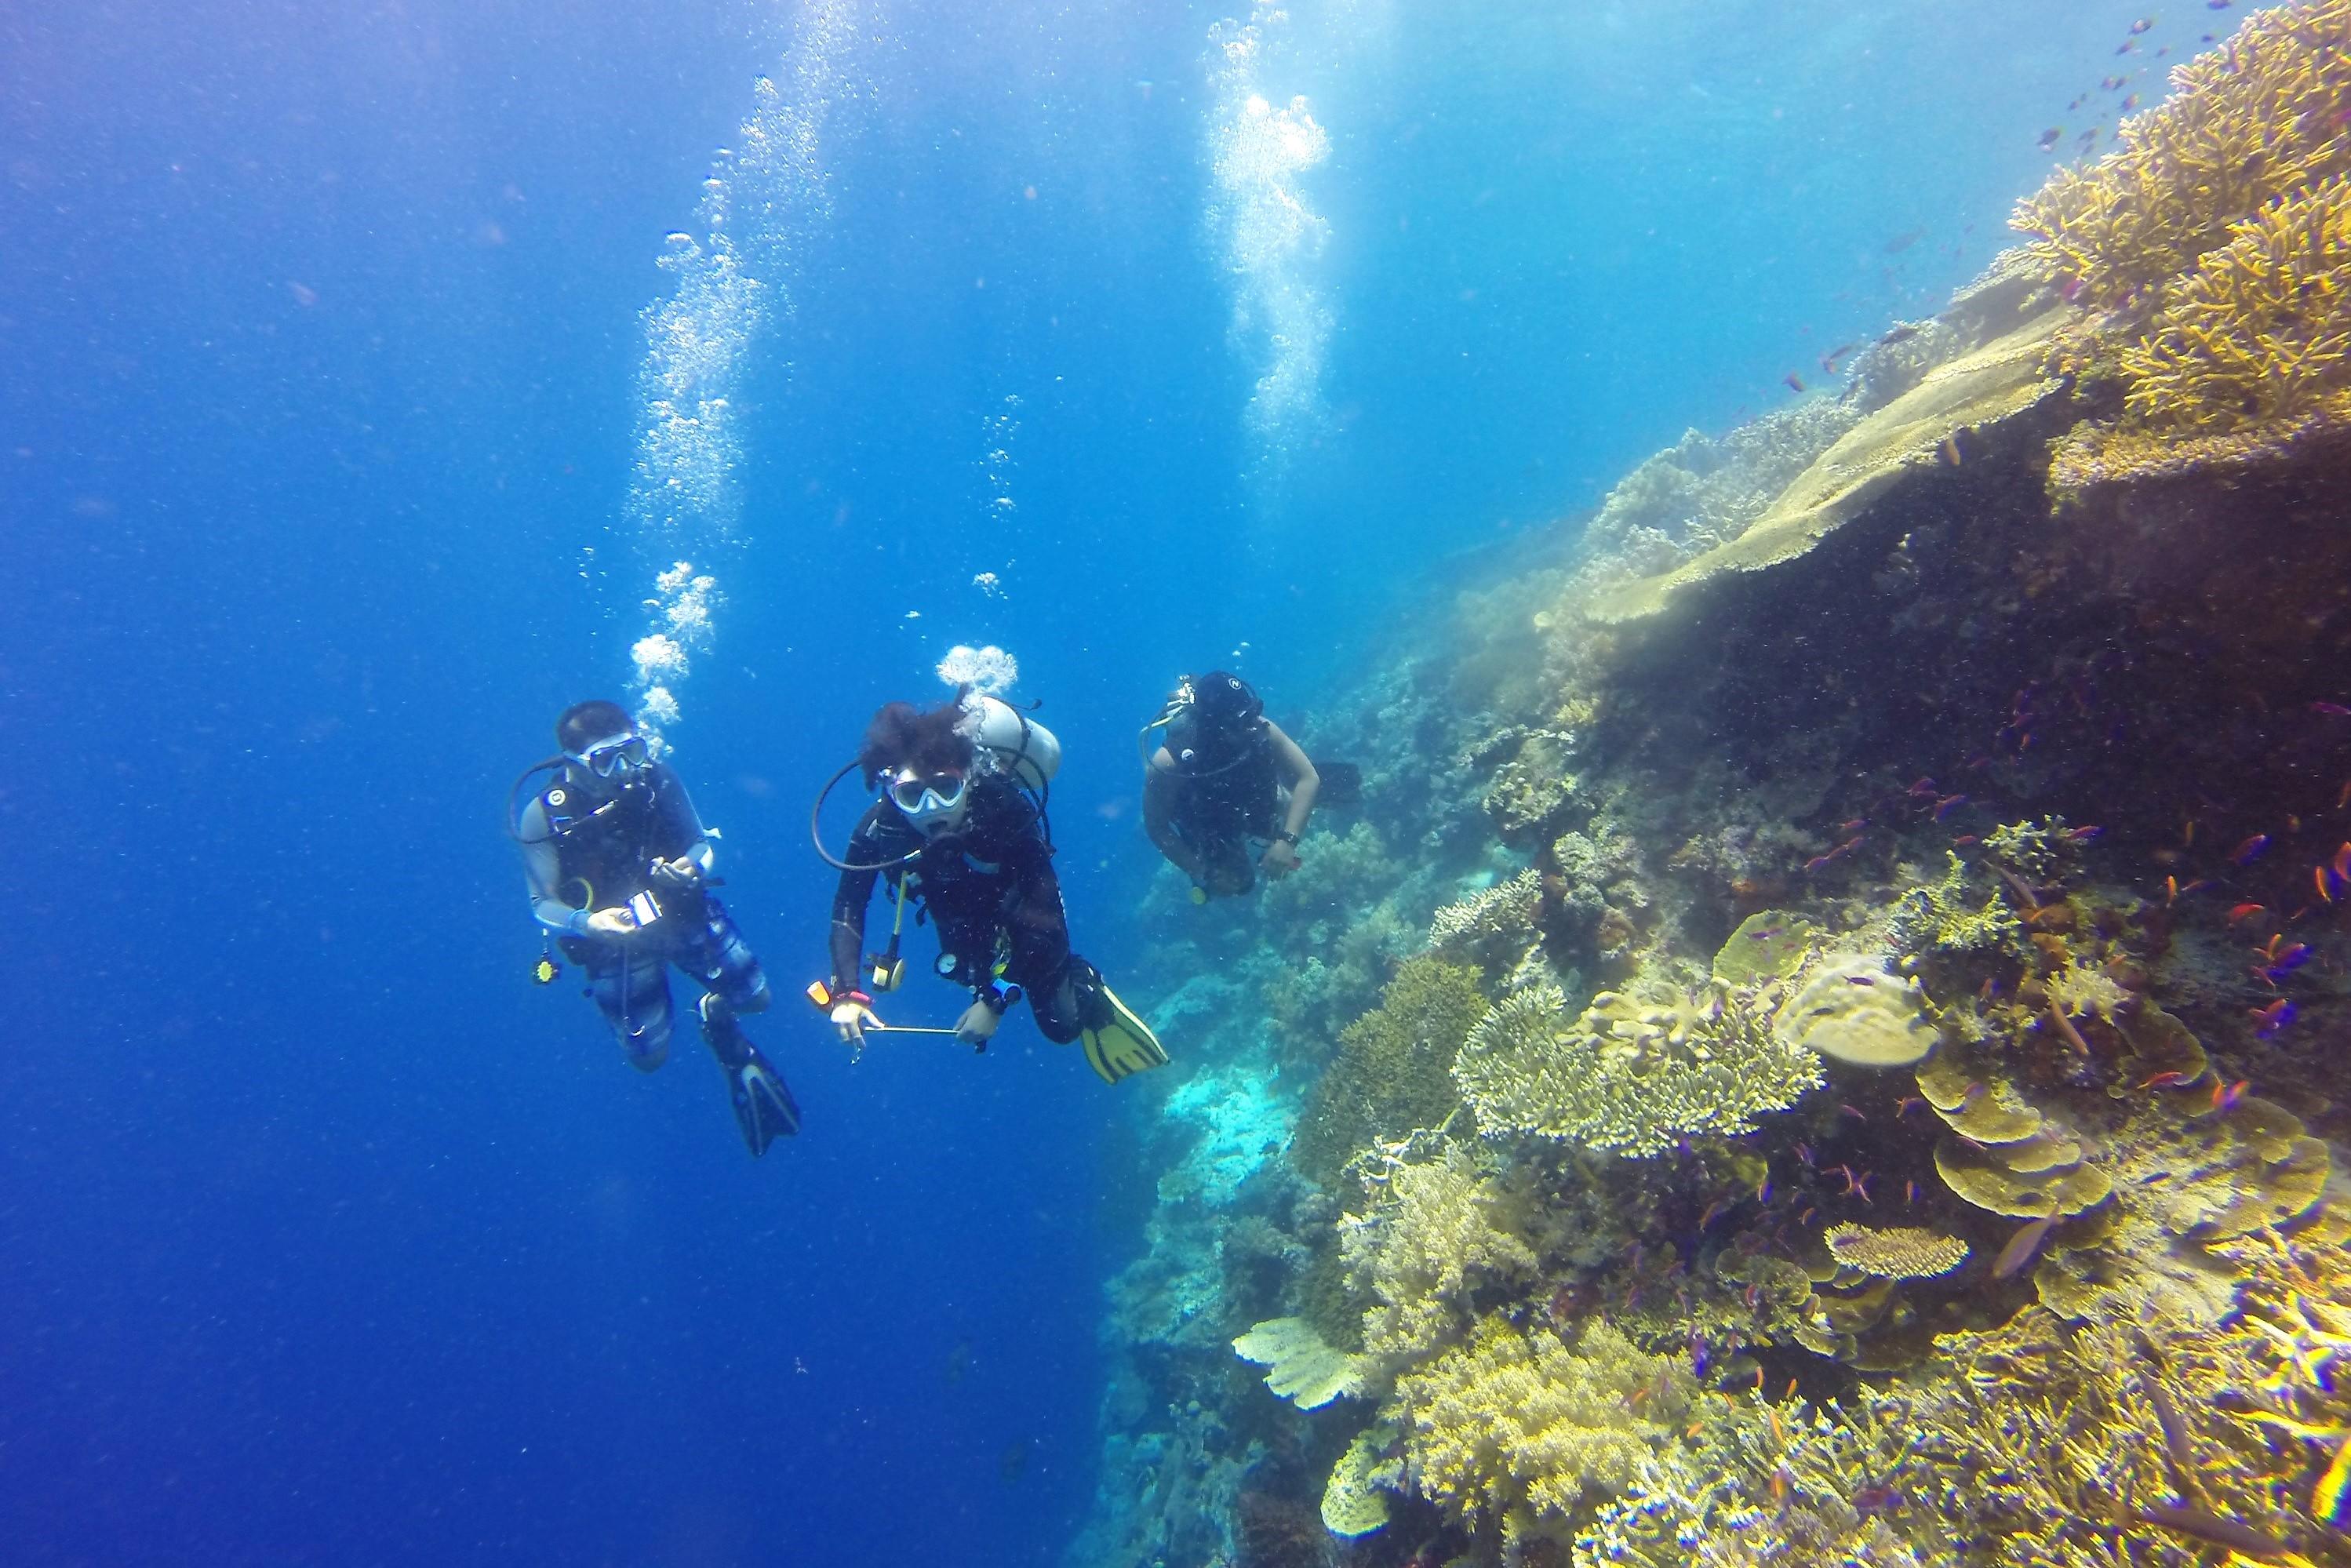 https://bubo.sk/uploads/galleries/8377/atauro-diving.jpg